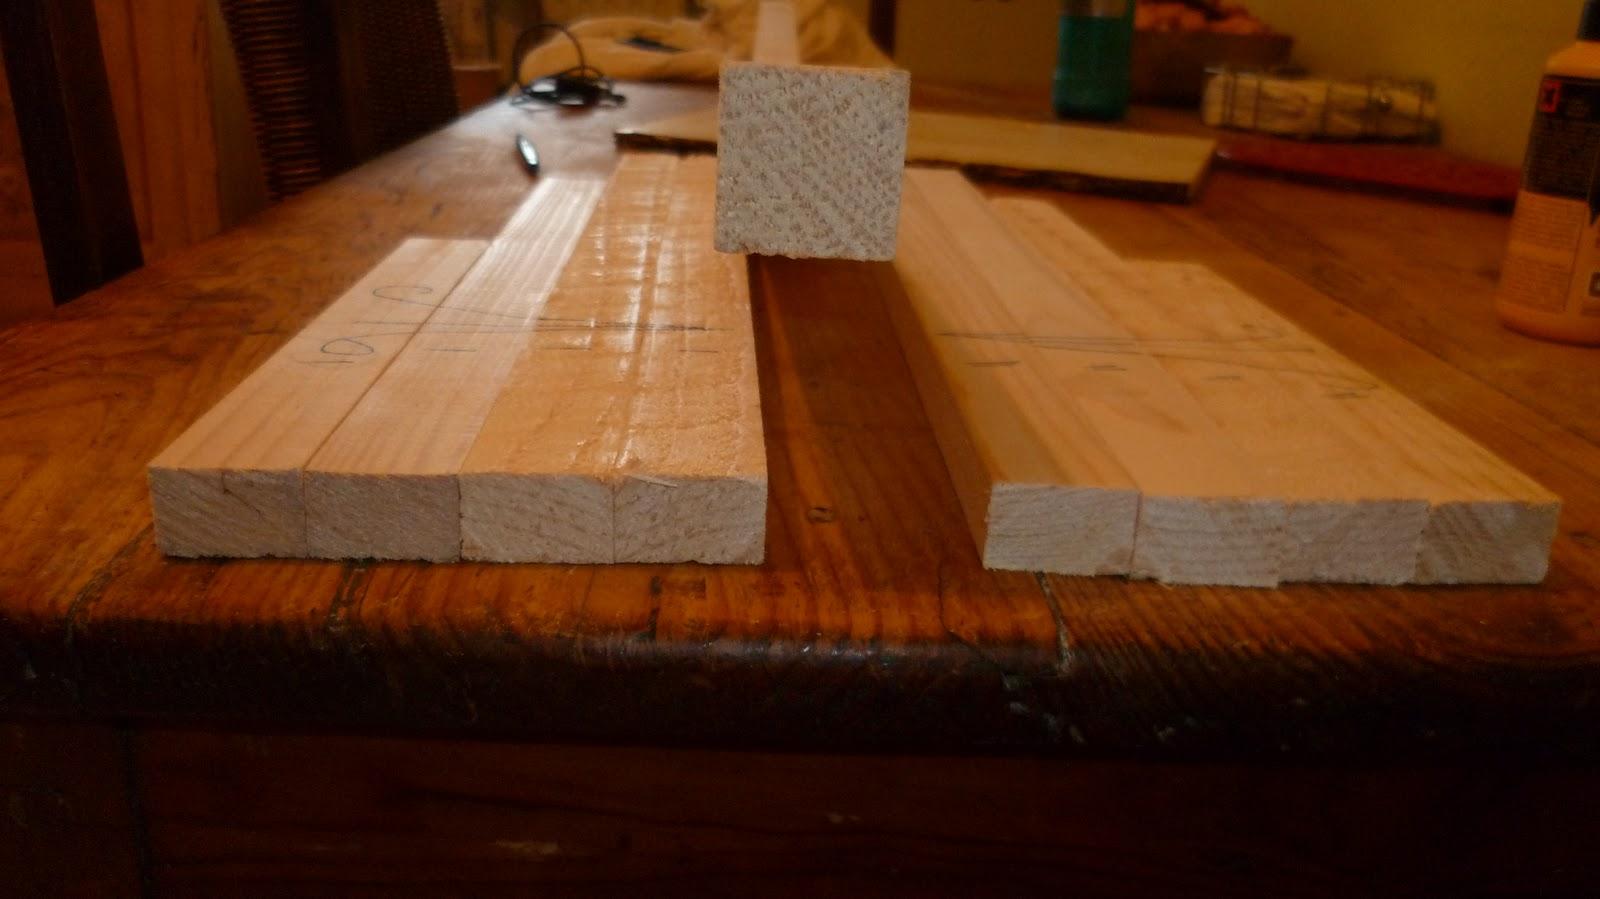 fabriquer une rame 3 va 39 atoru. Black Bedroom Furniture Sets. Home Design Ideas